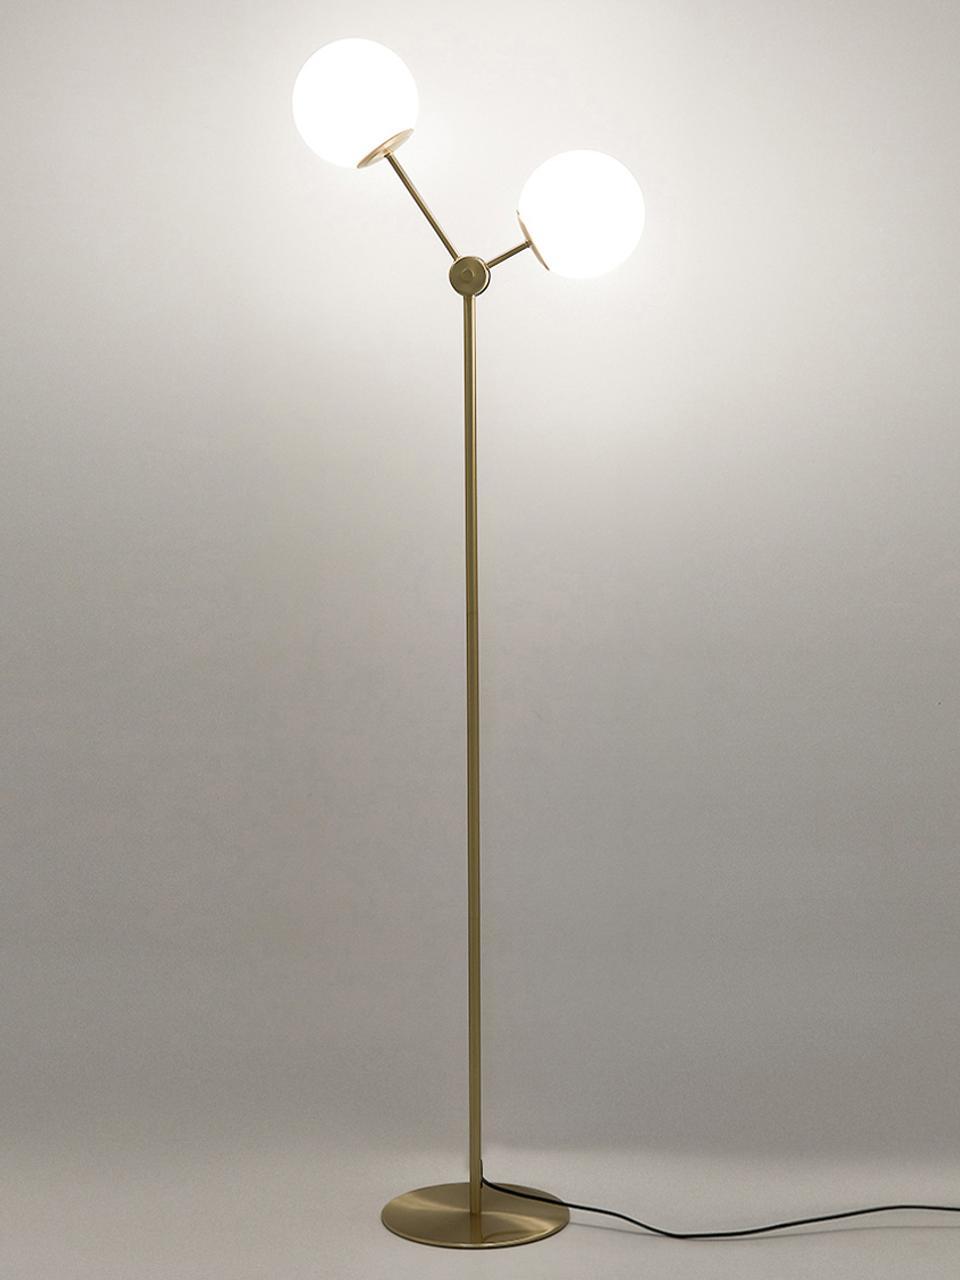 Stehlampe Aurelia aus Opalglas, Lampenfuß: Metall, vermessingt, Messing, Weiß, Ø 17 x H 155 cm